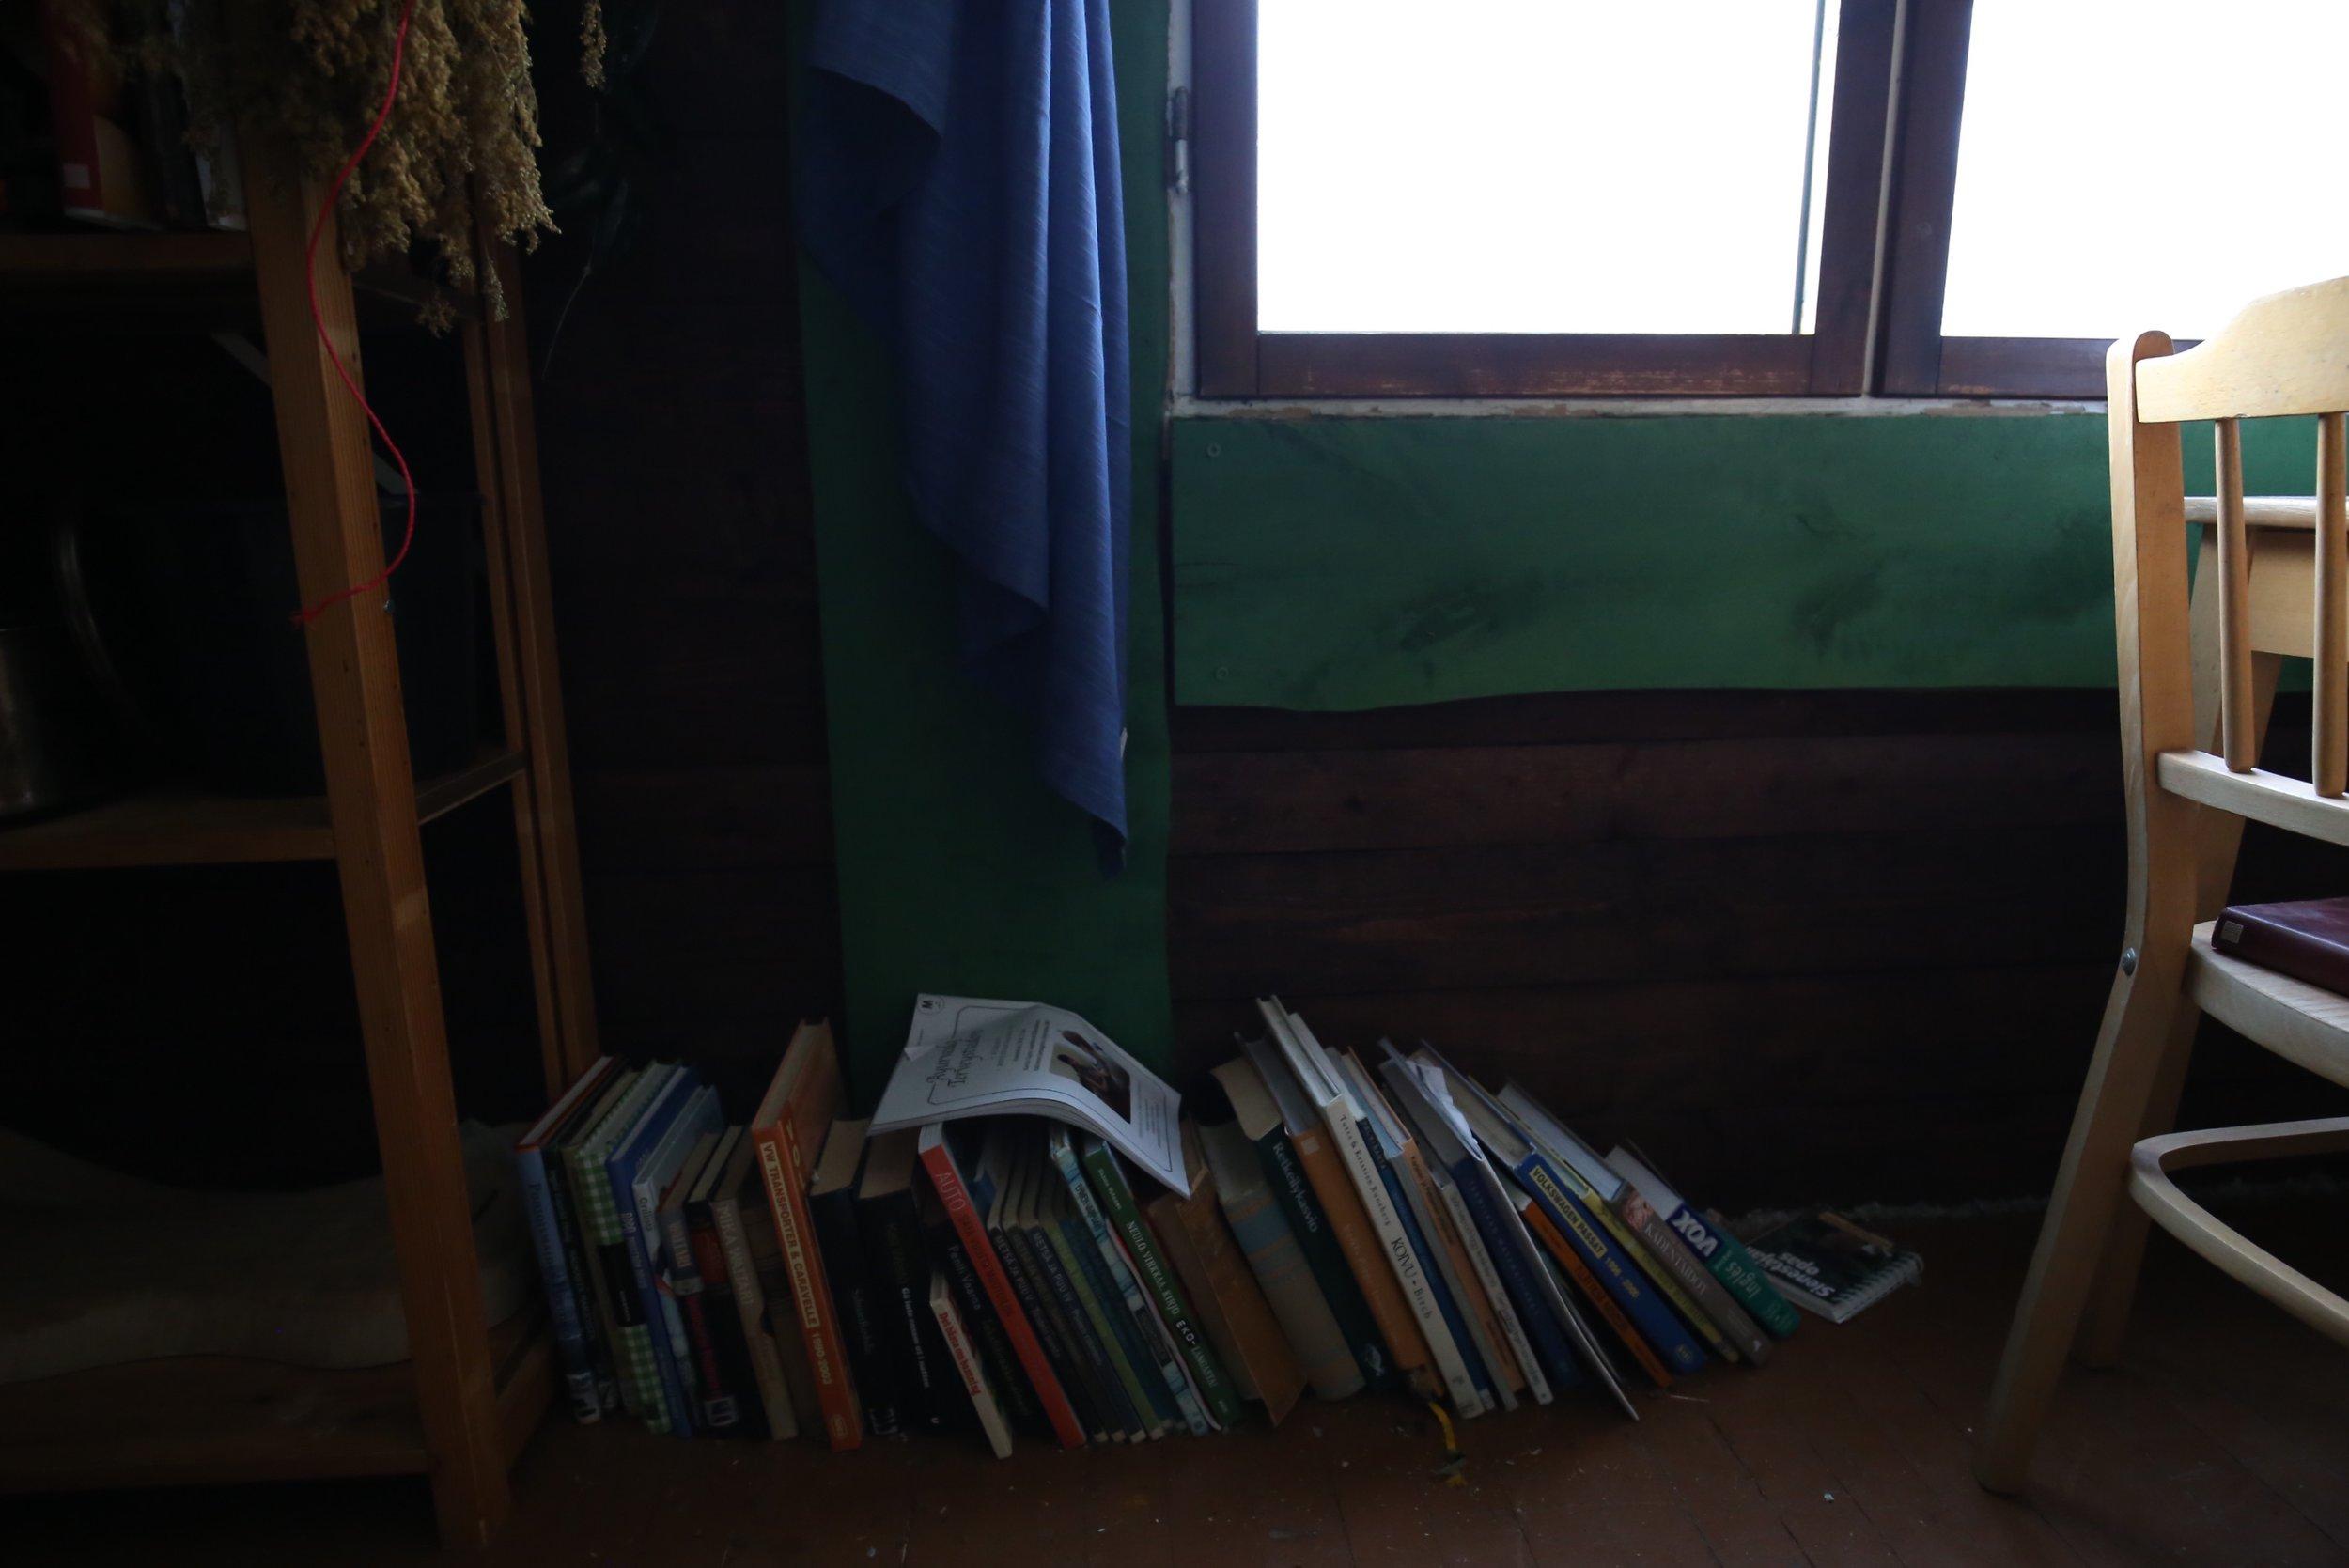 books on the floor